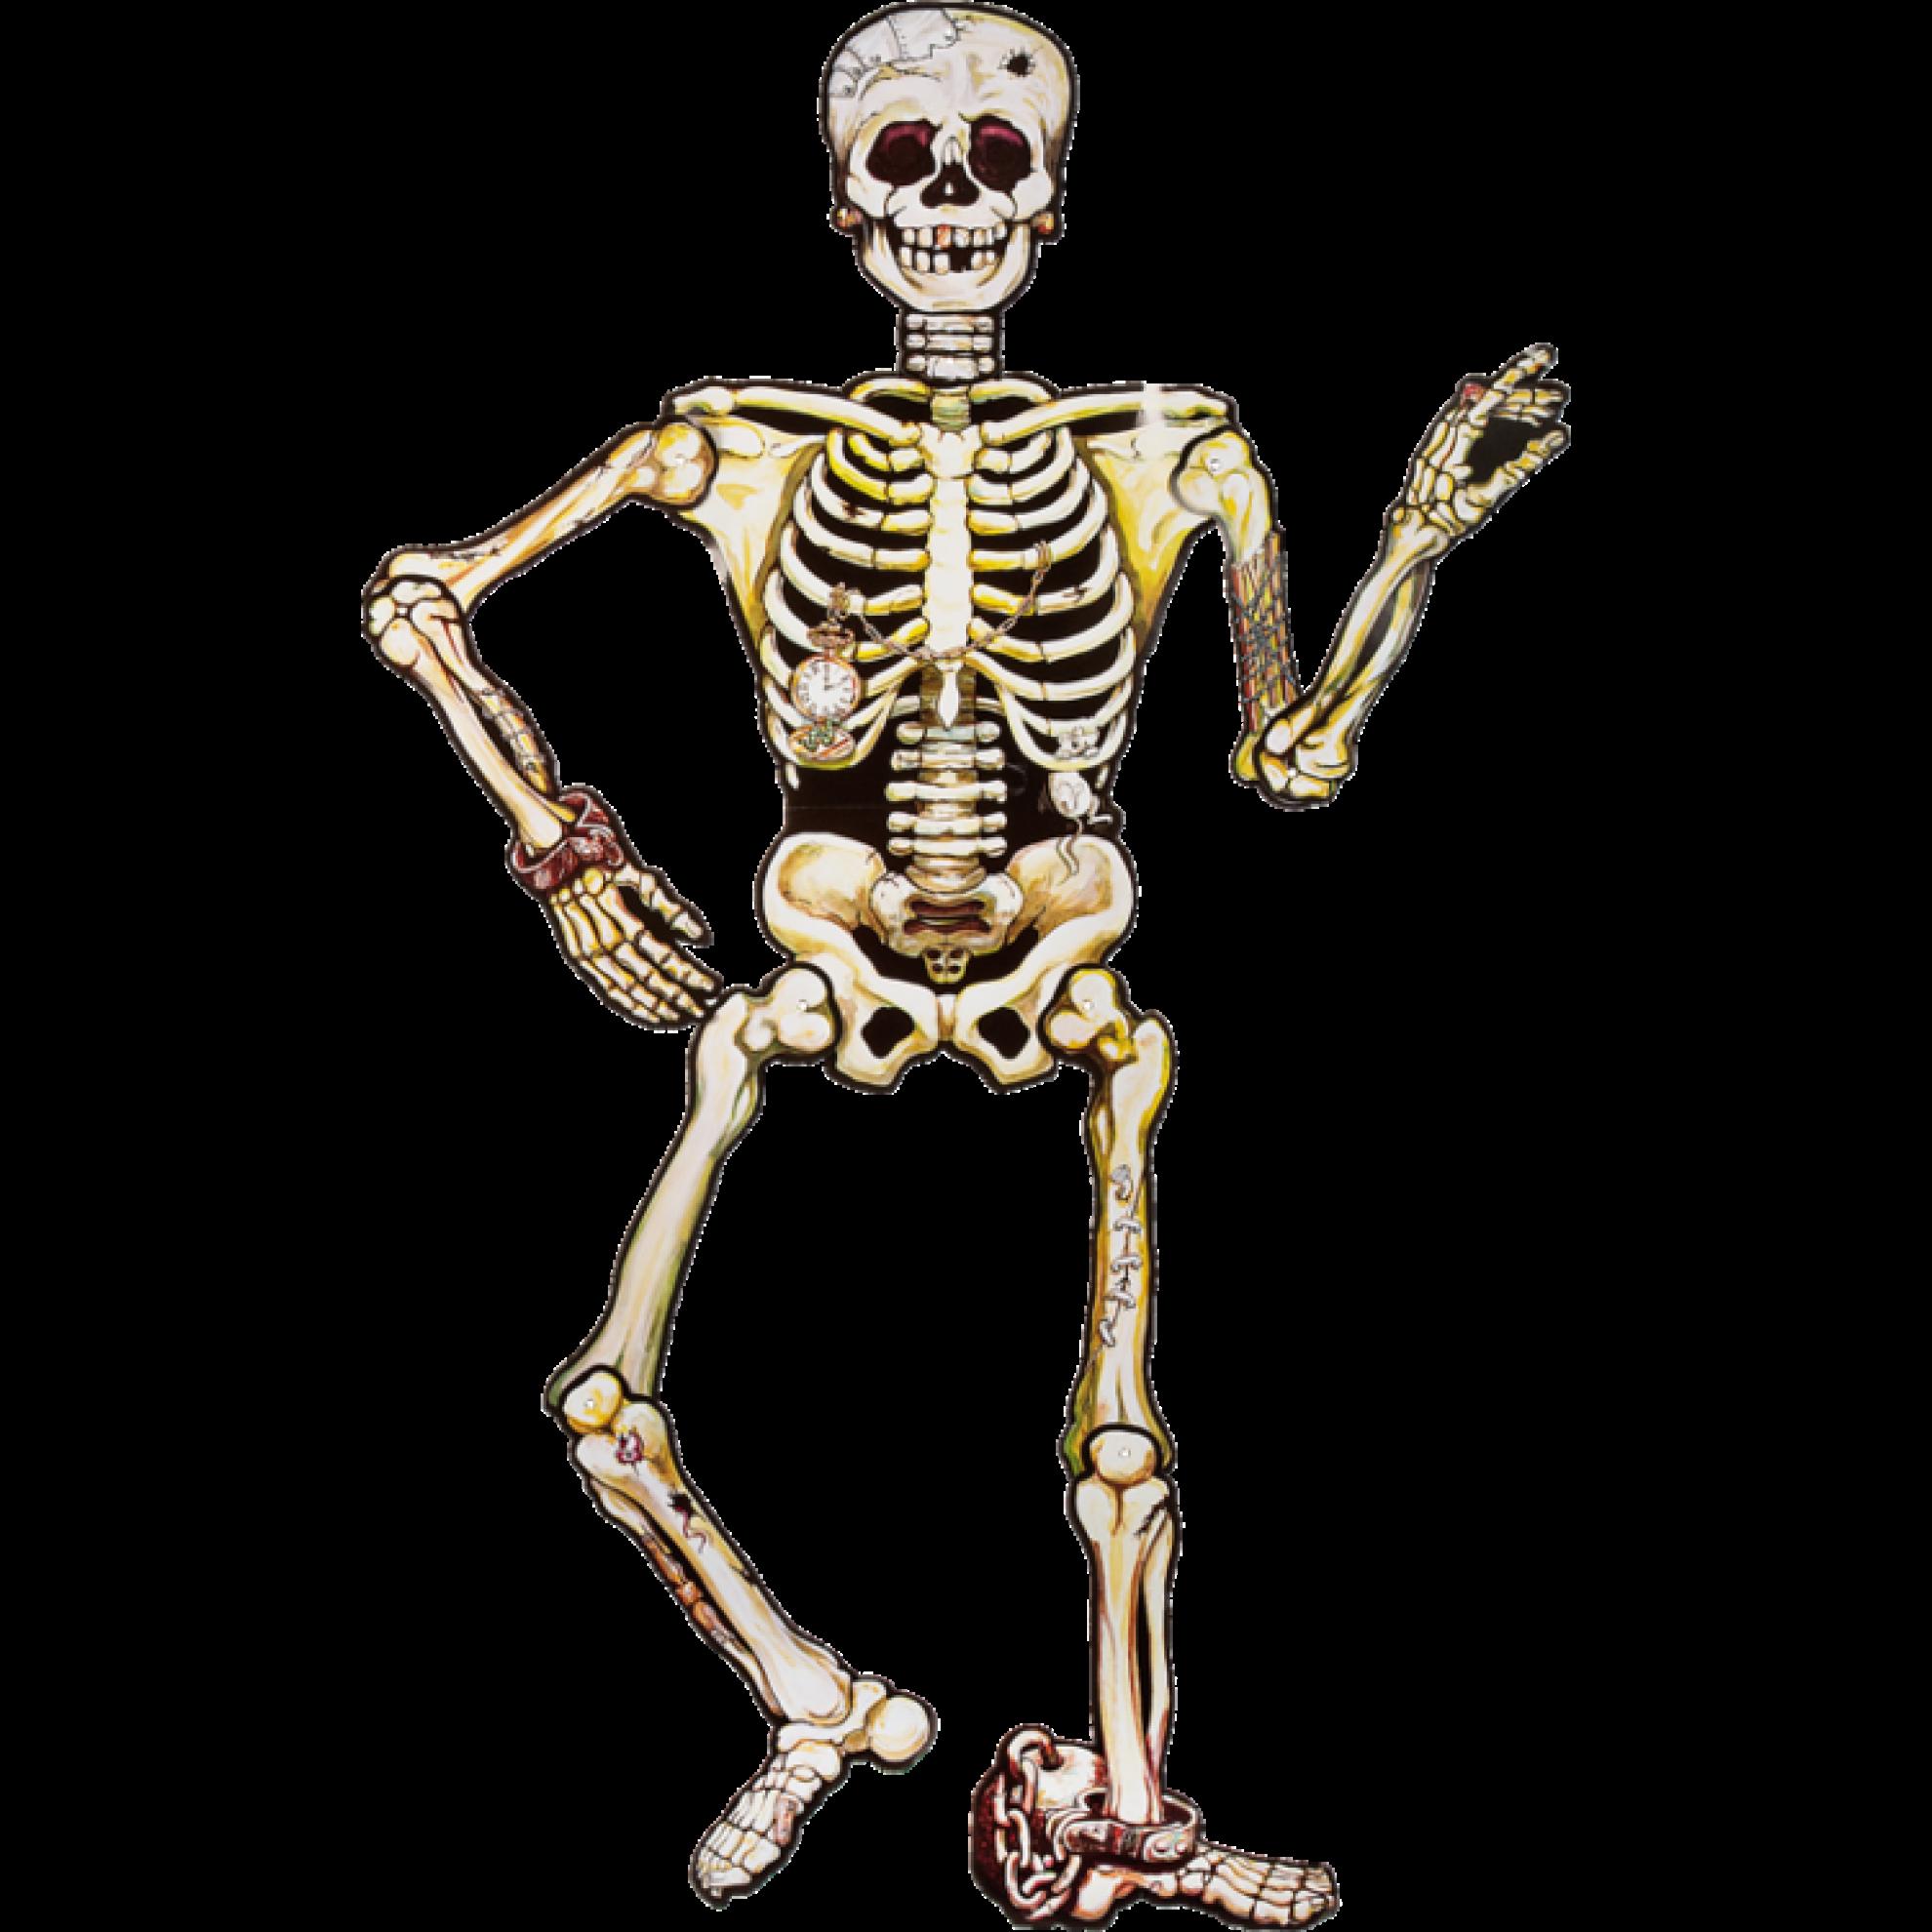 Skelett http://www.partydiscount24.de/wanddekoration-riesen-skelett